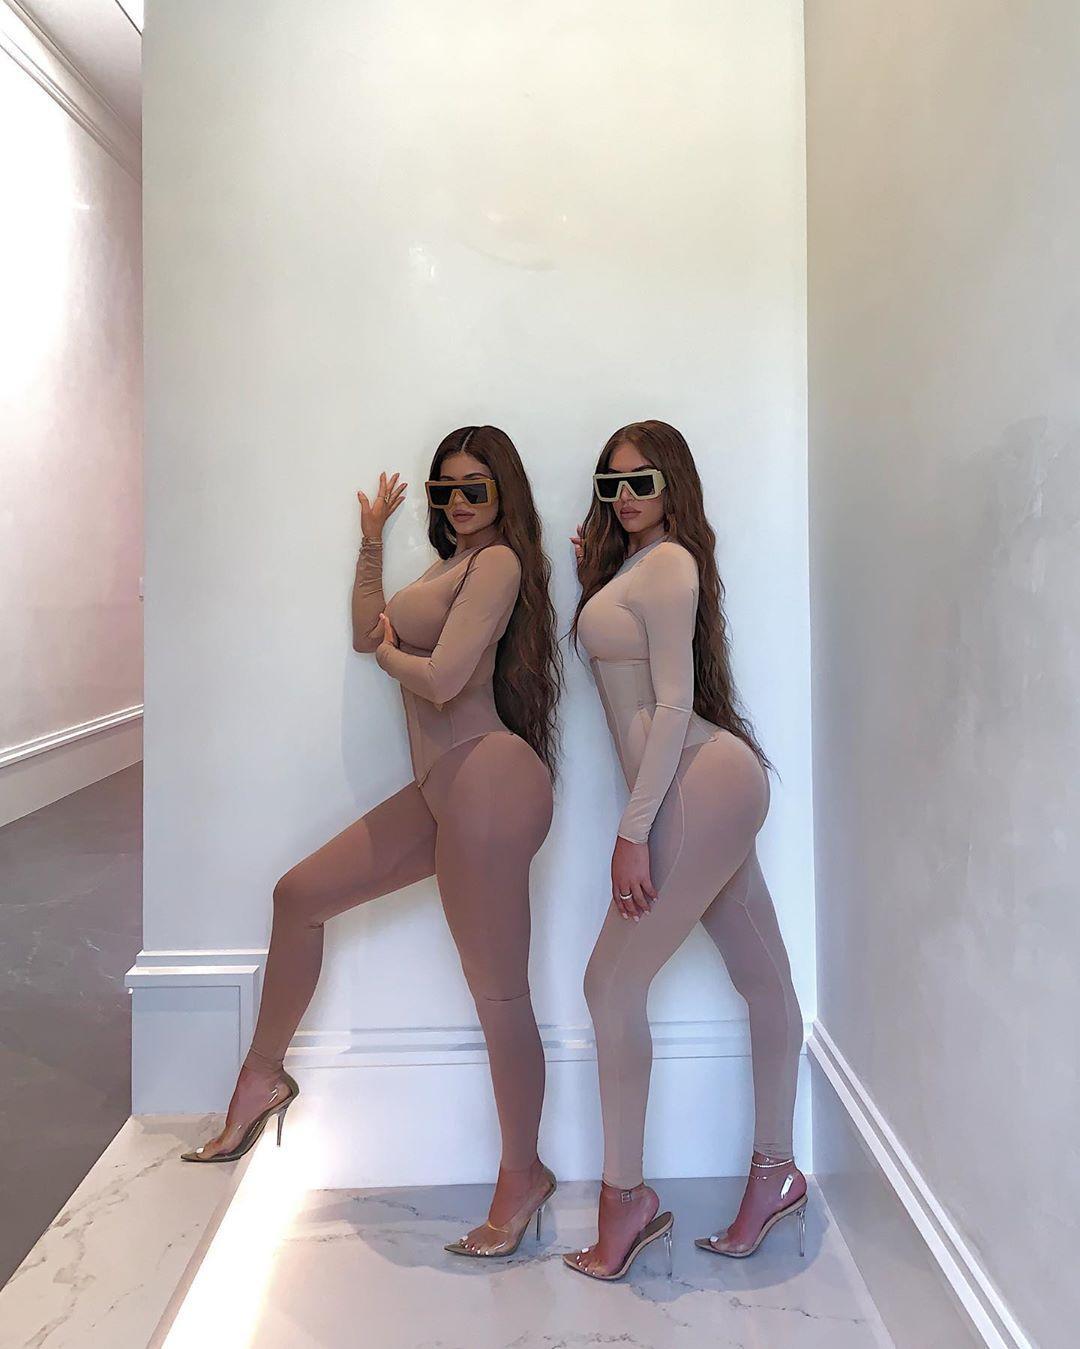 Kylie Jenner Lesbian Bikini See Through Dress Photoshoot Leaked 0004